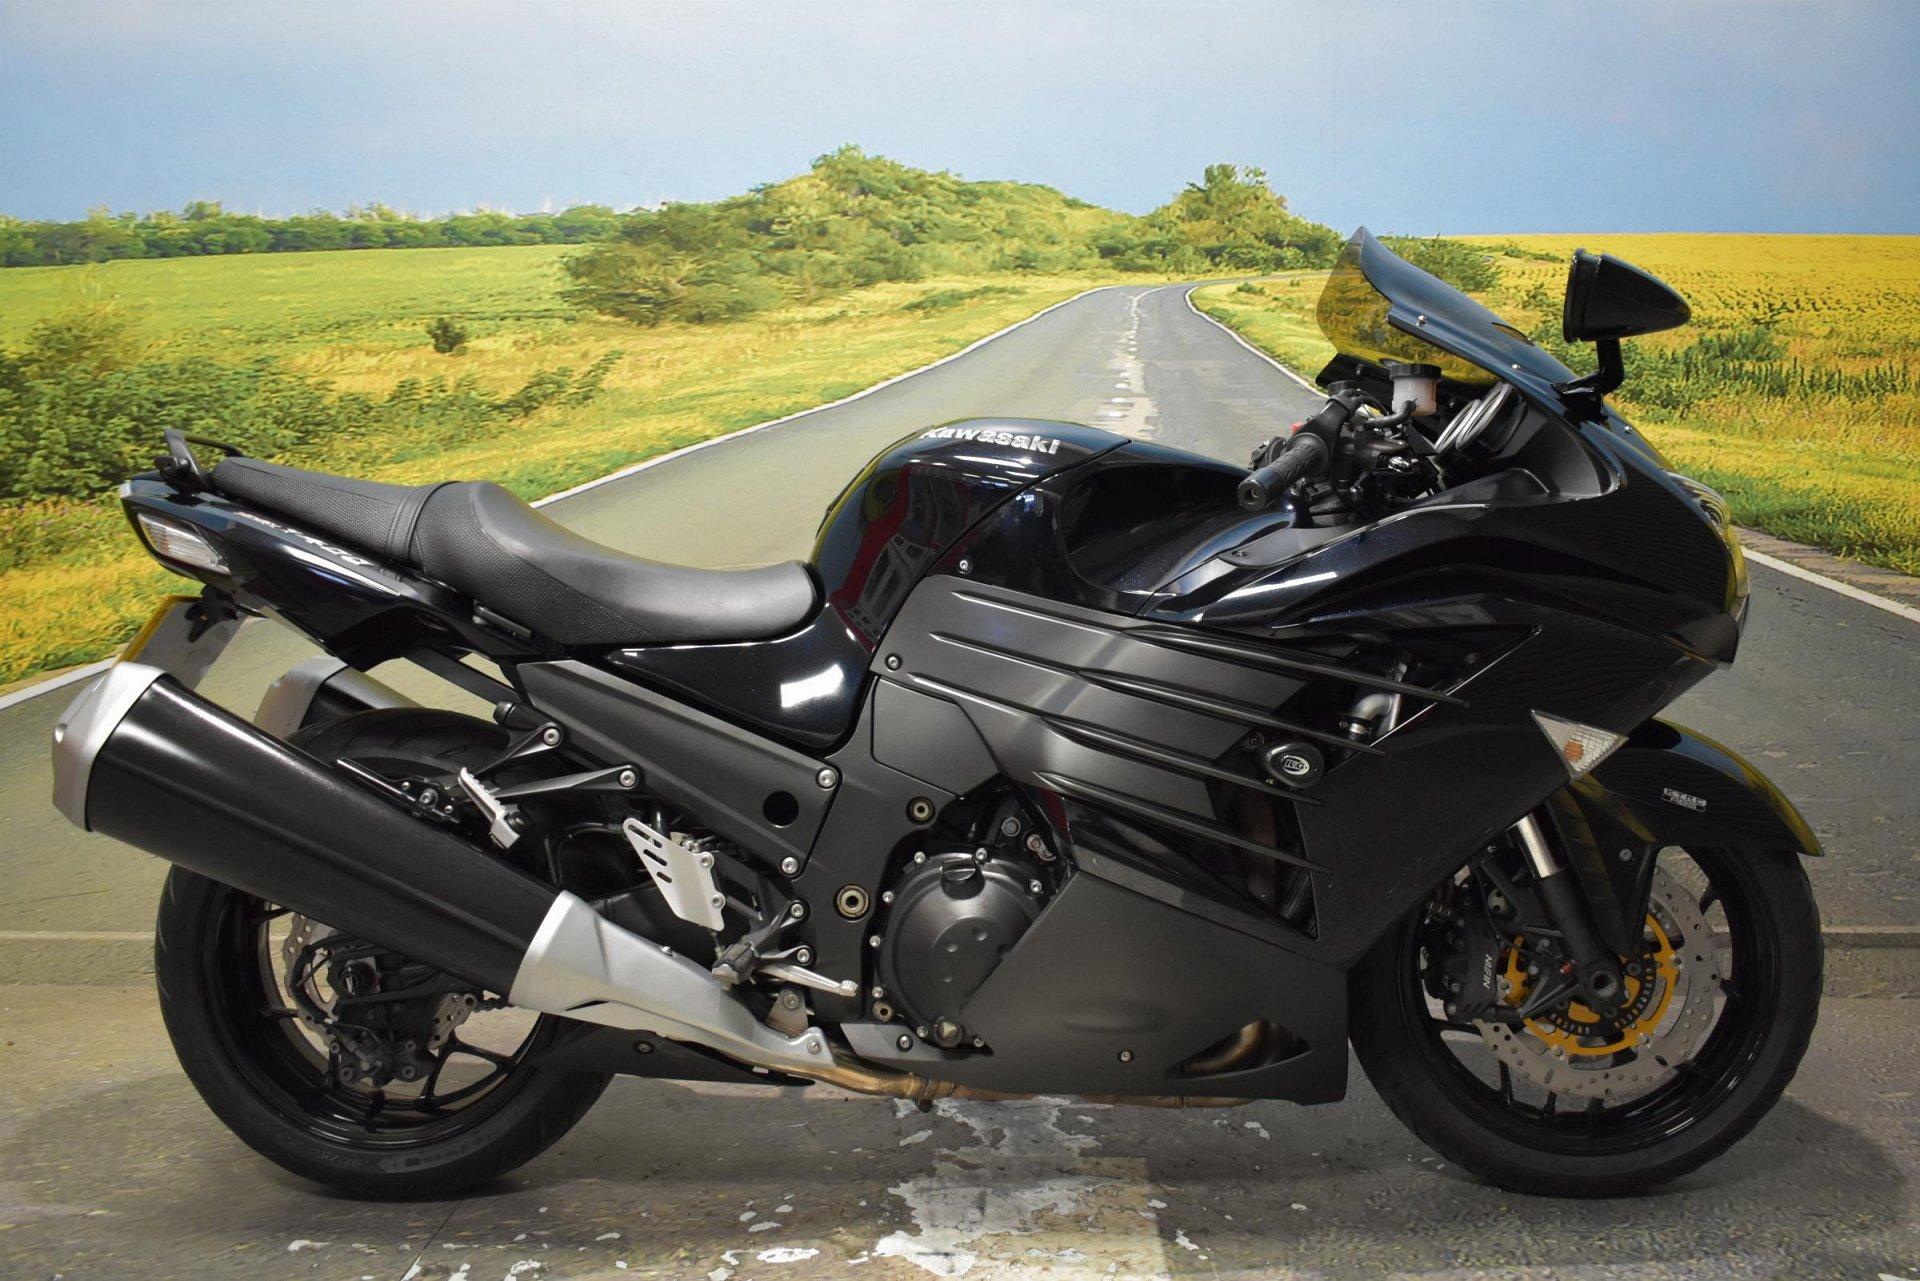 2013 Kawasaki ZZR1400 for sale in Derbyshire